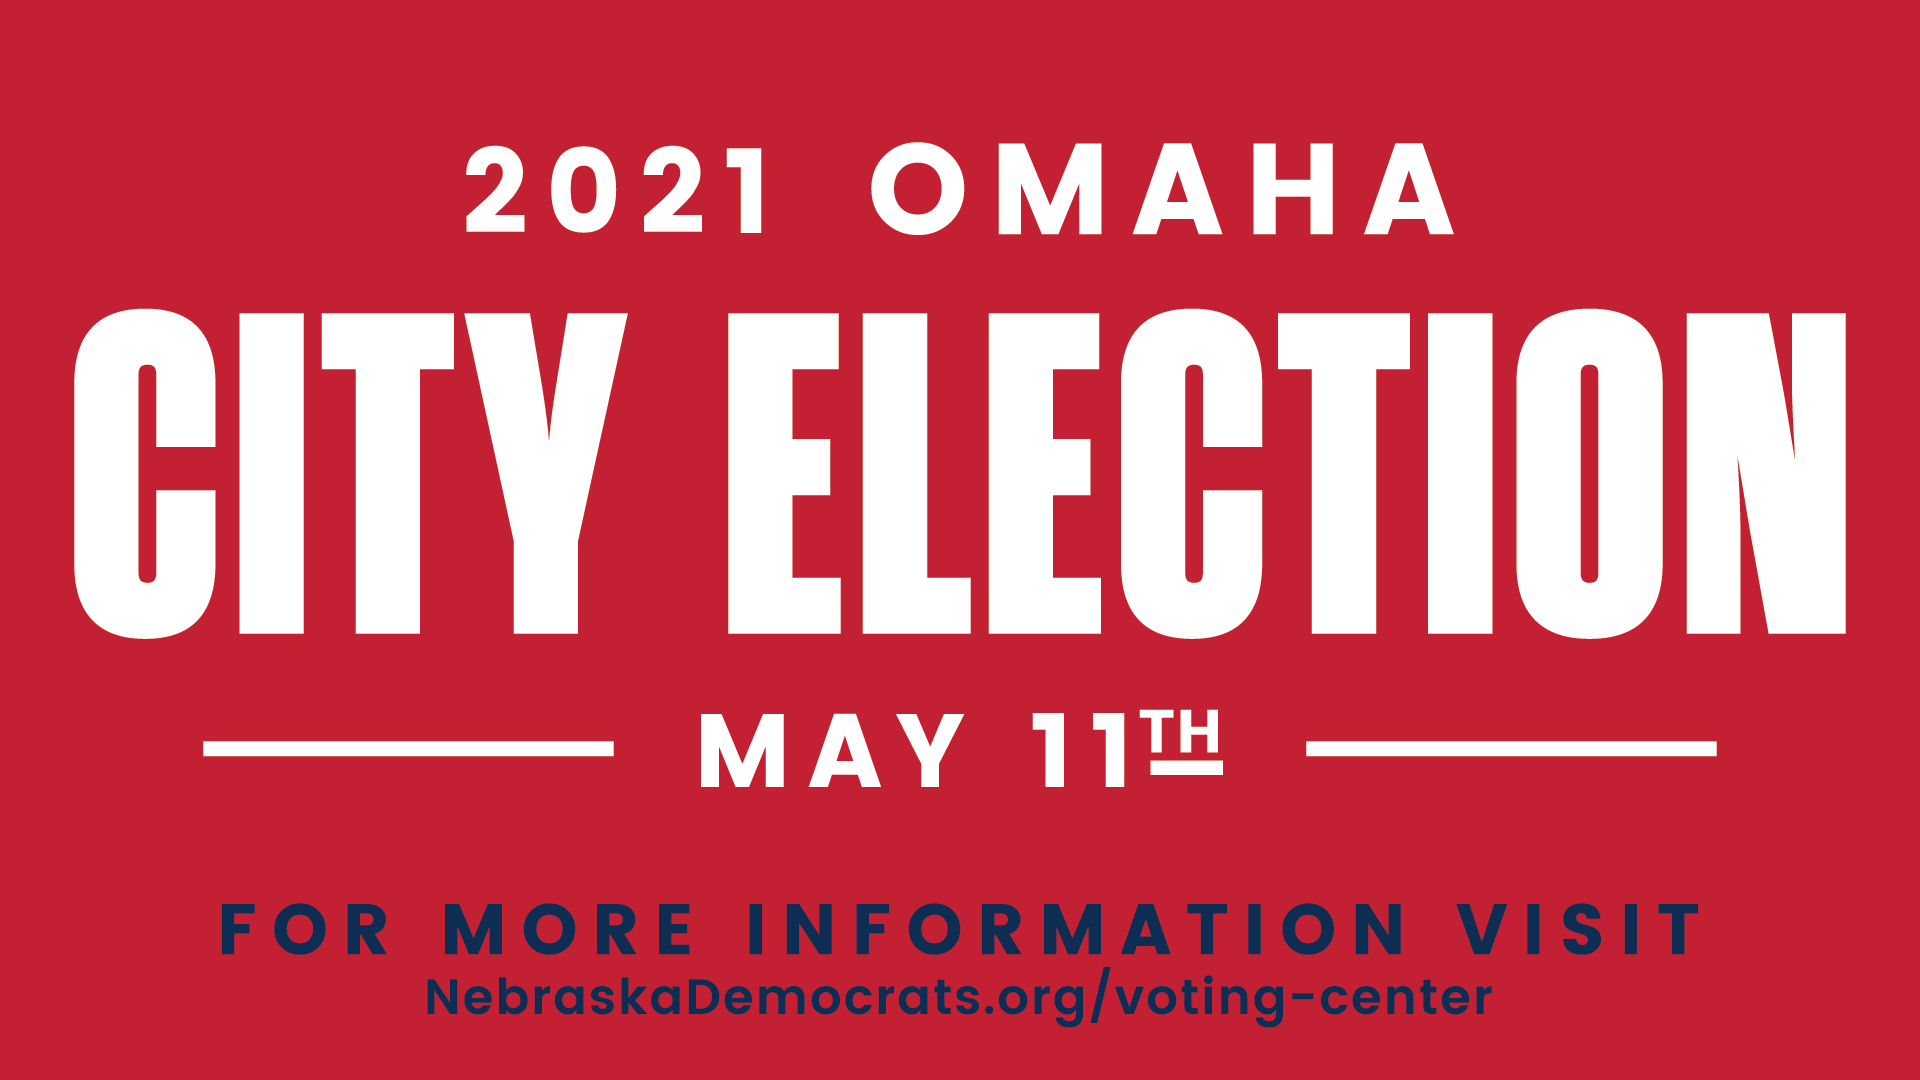 2021 Omaha City Election